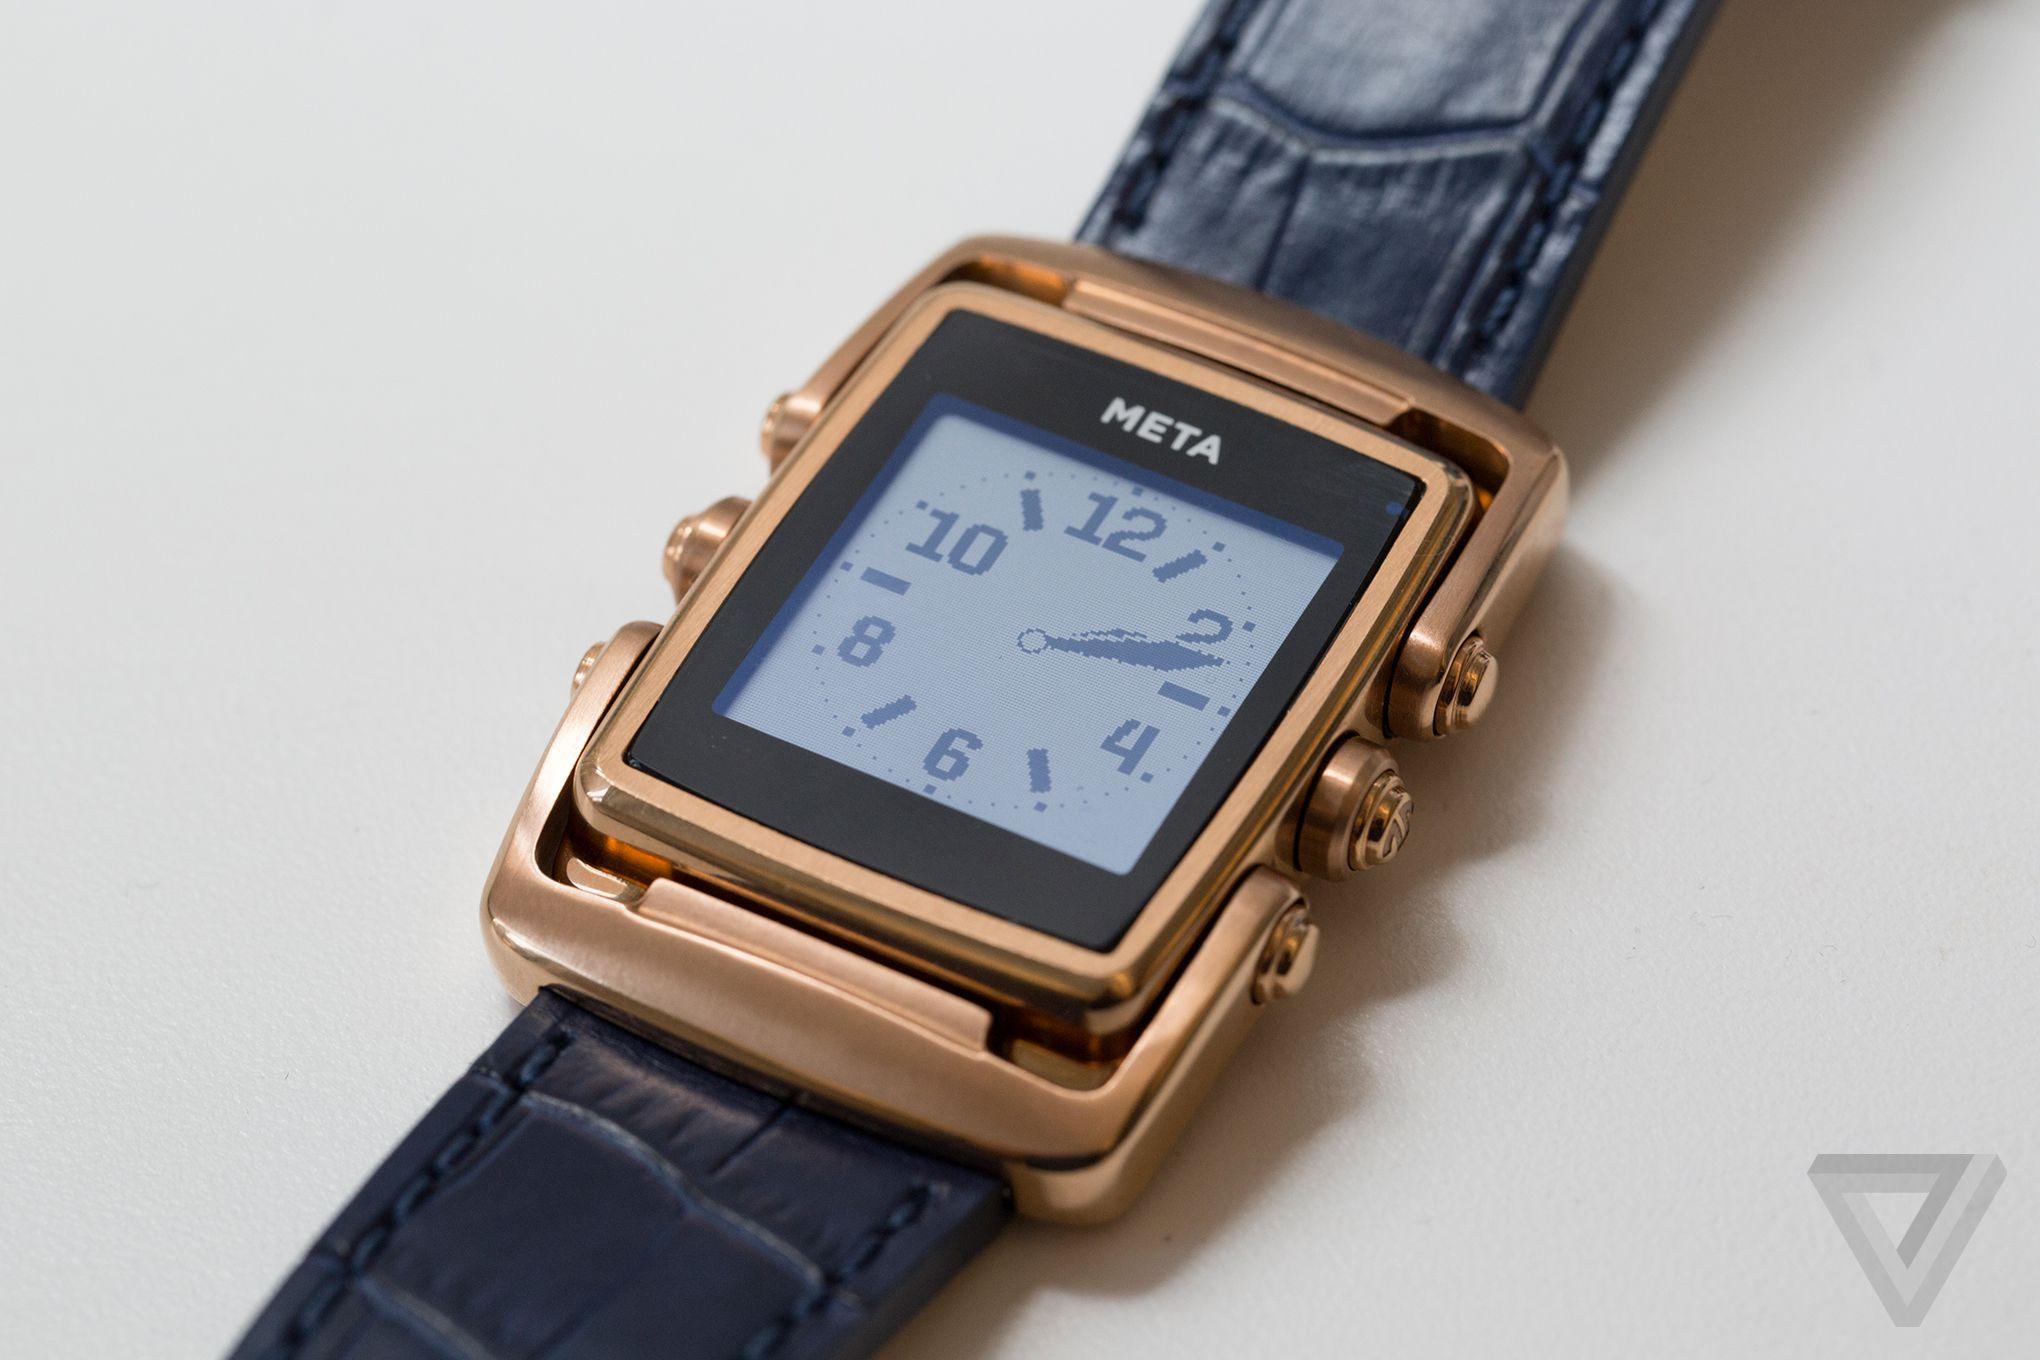 Meta Watch Meta M1 Review The Watchmaker S Smartwatch